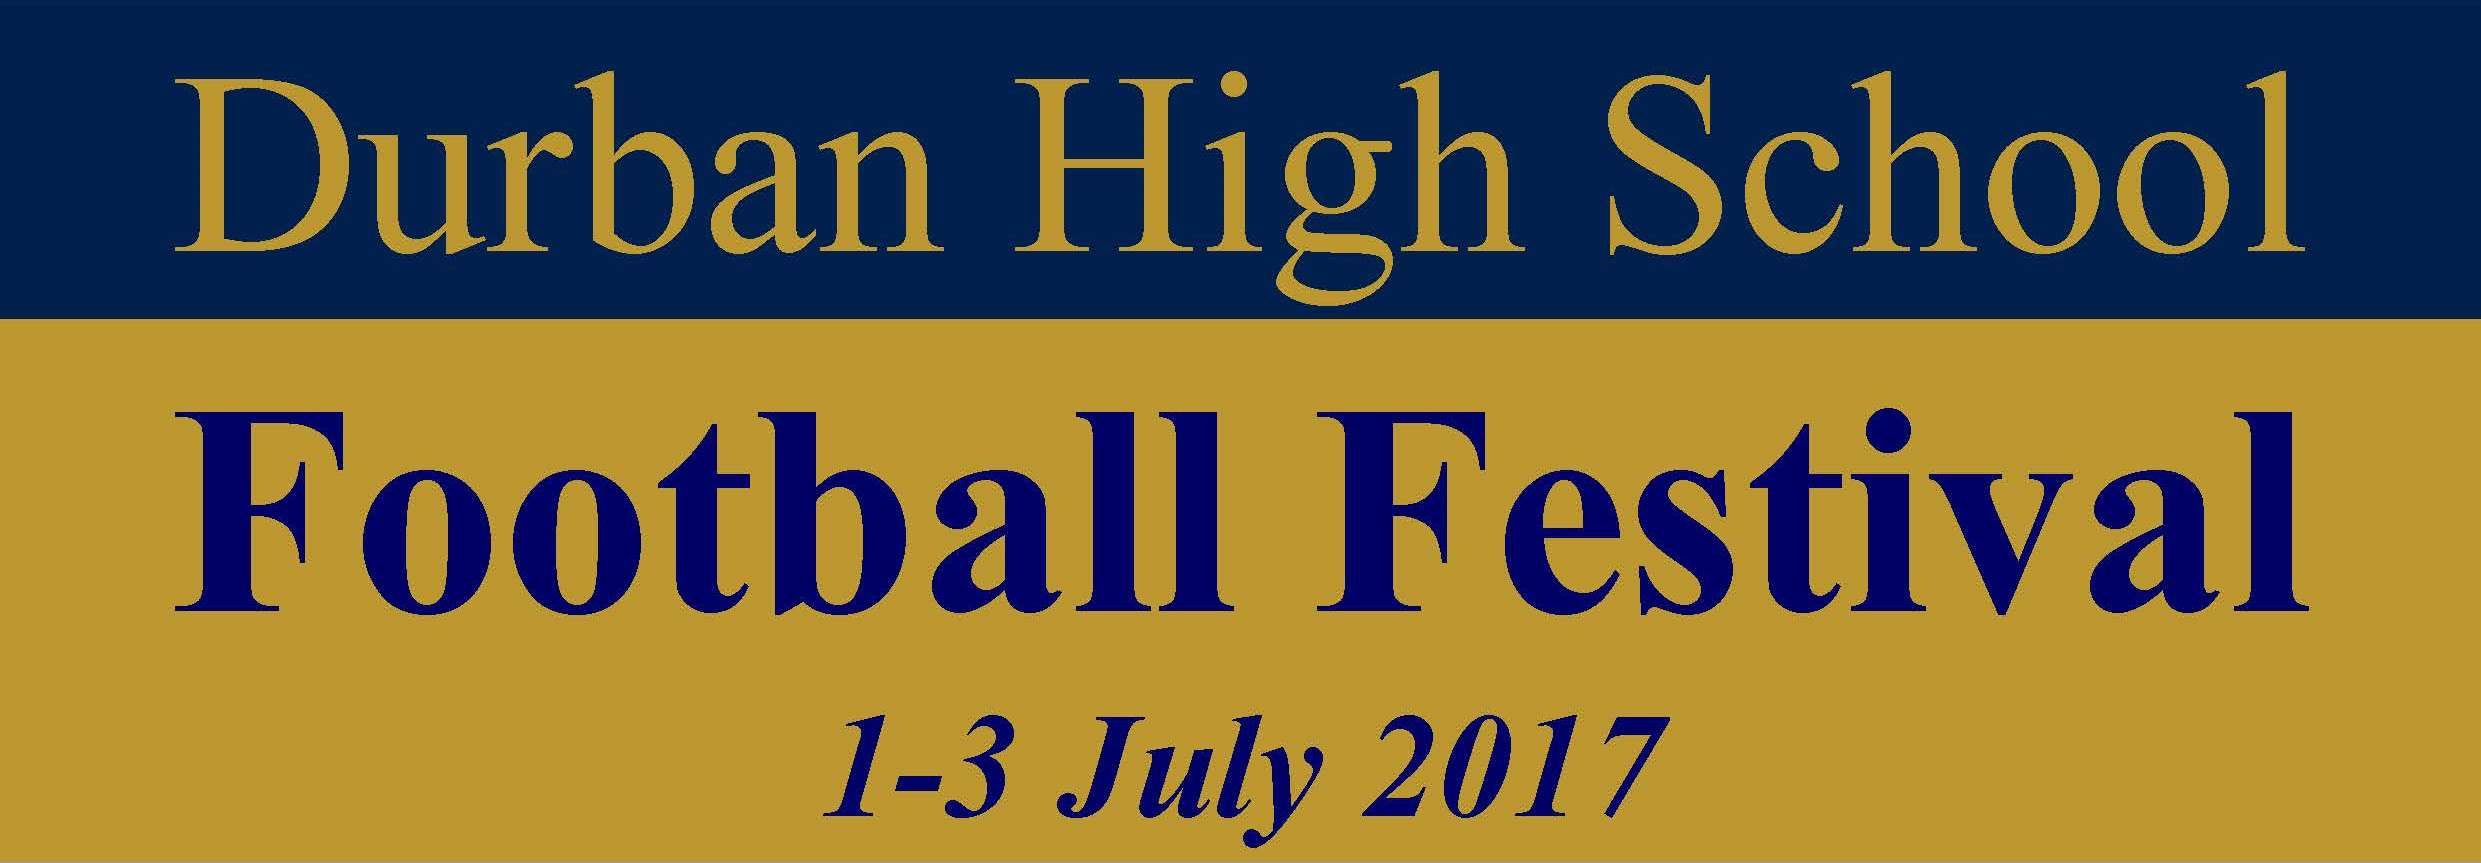 DHS Football Festival